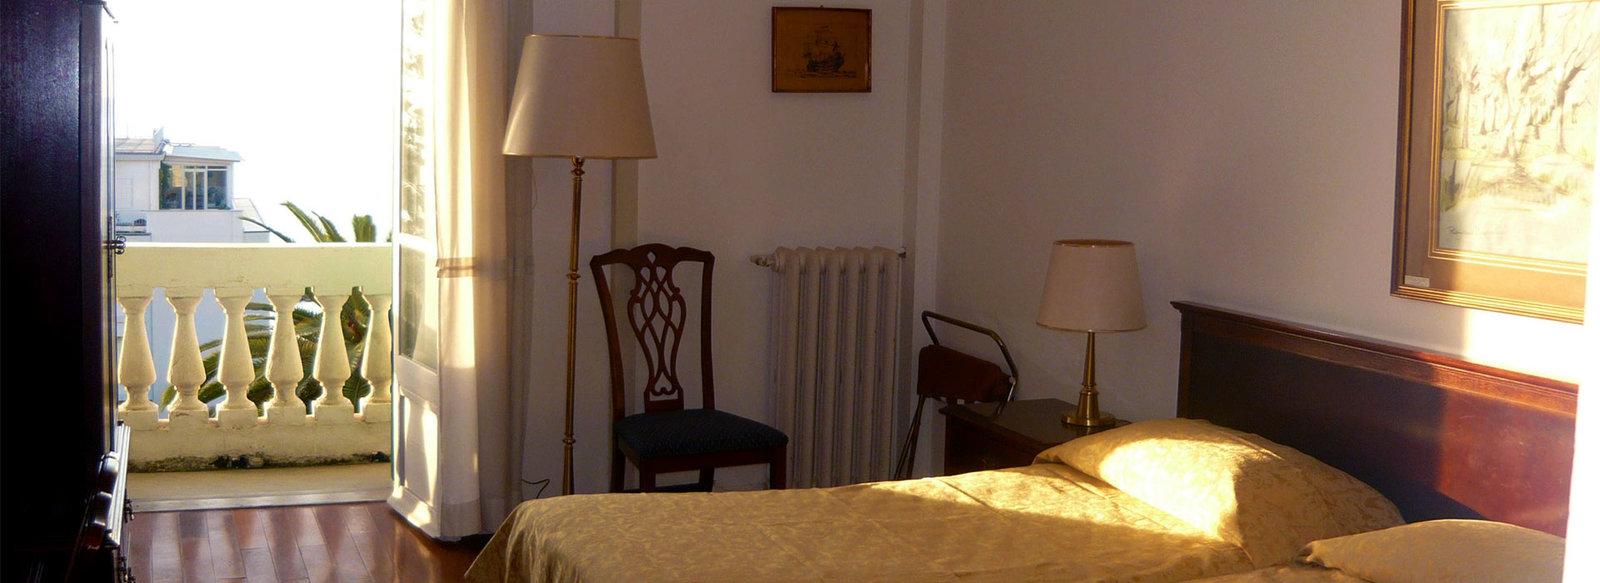 Hotel storico a Sanremo